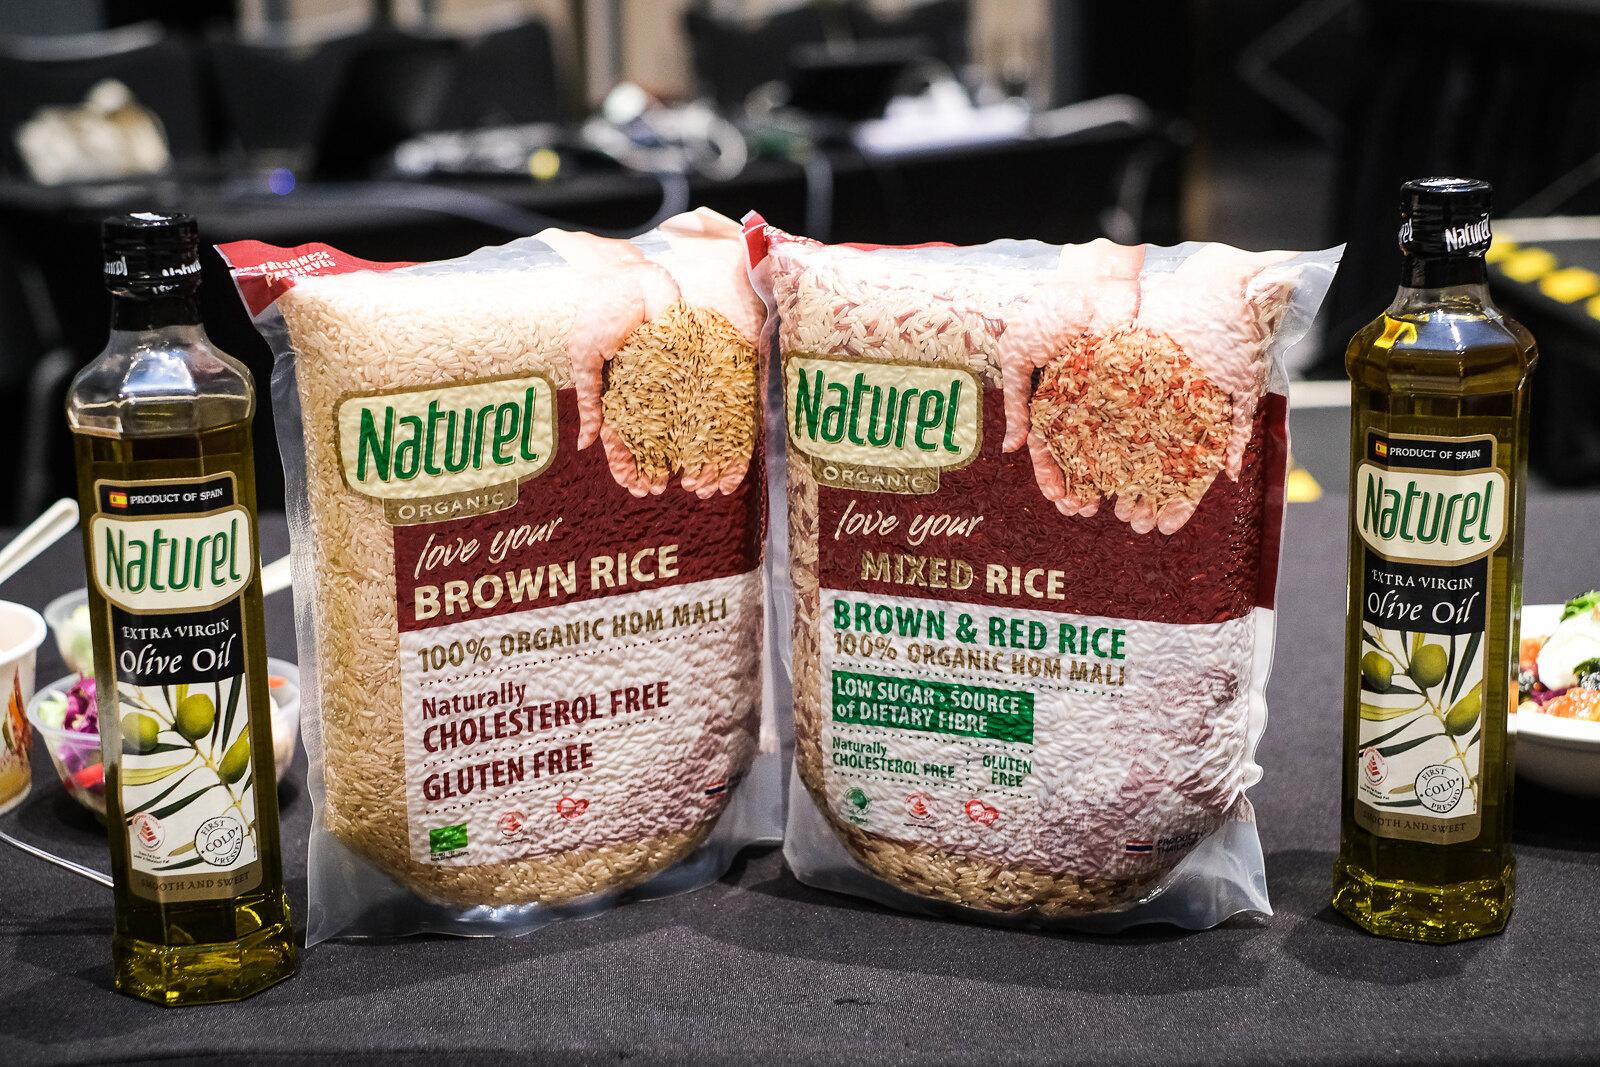 naturel products 2-2